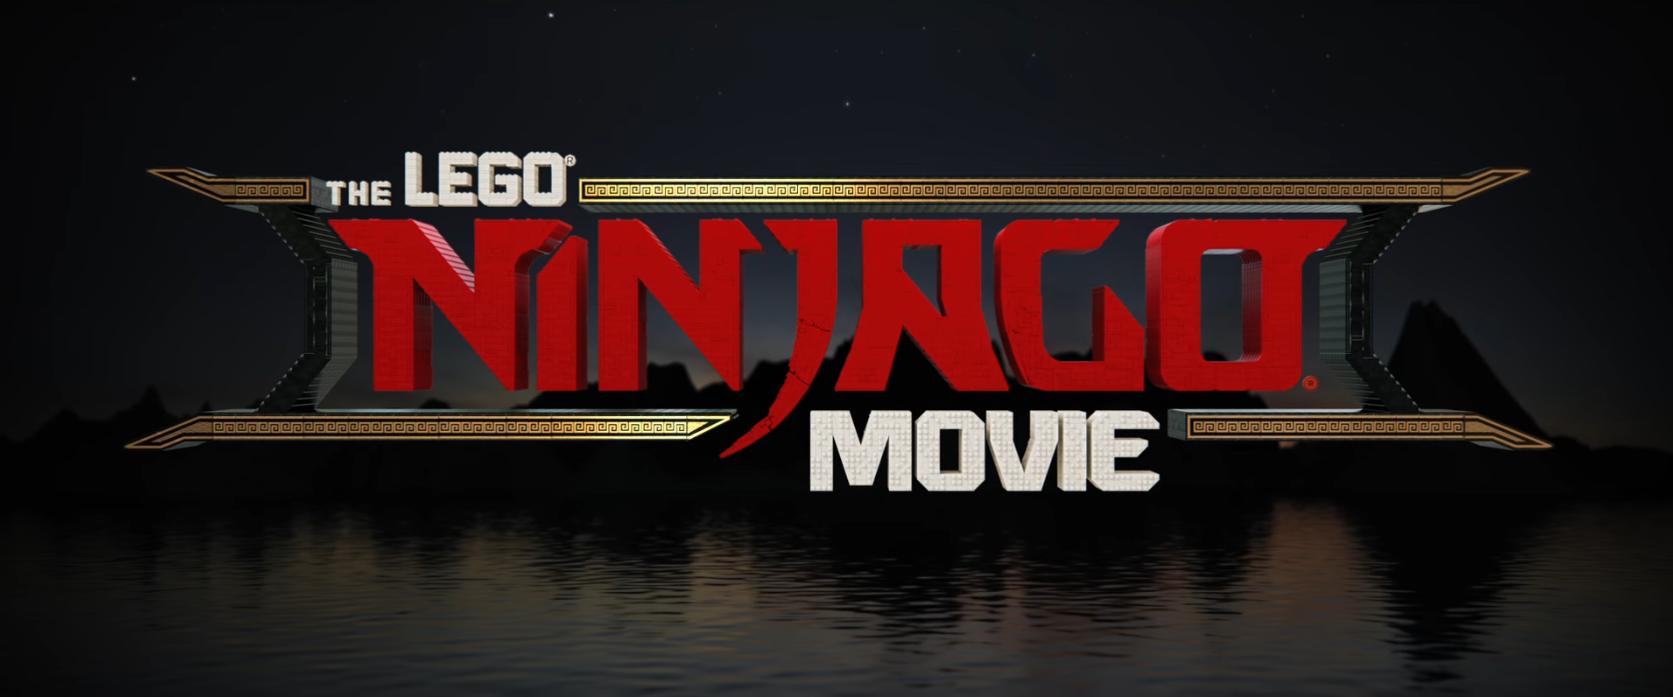 LEGO-Ninjago-Movie-Title